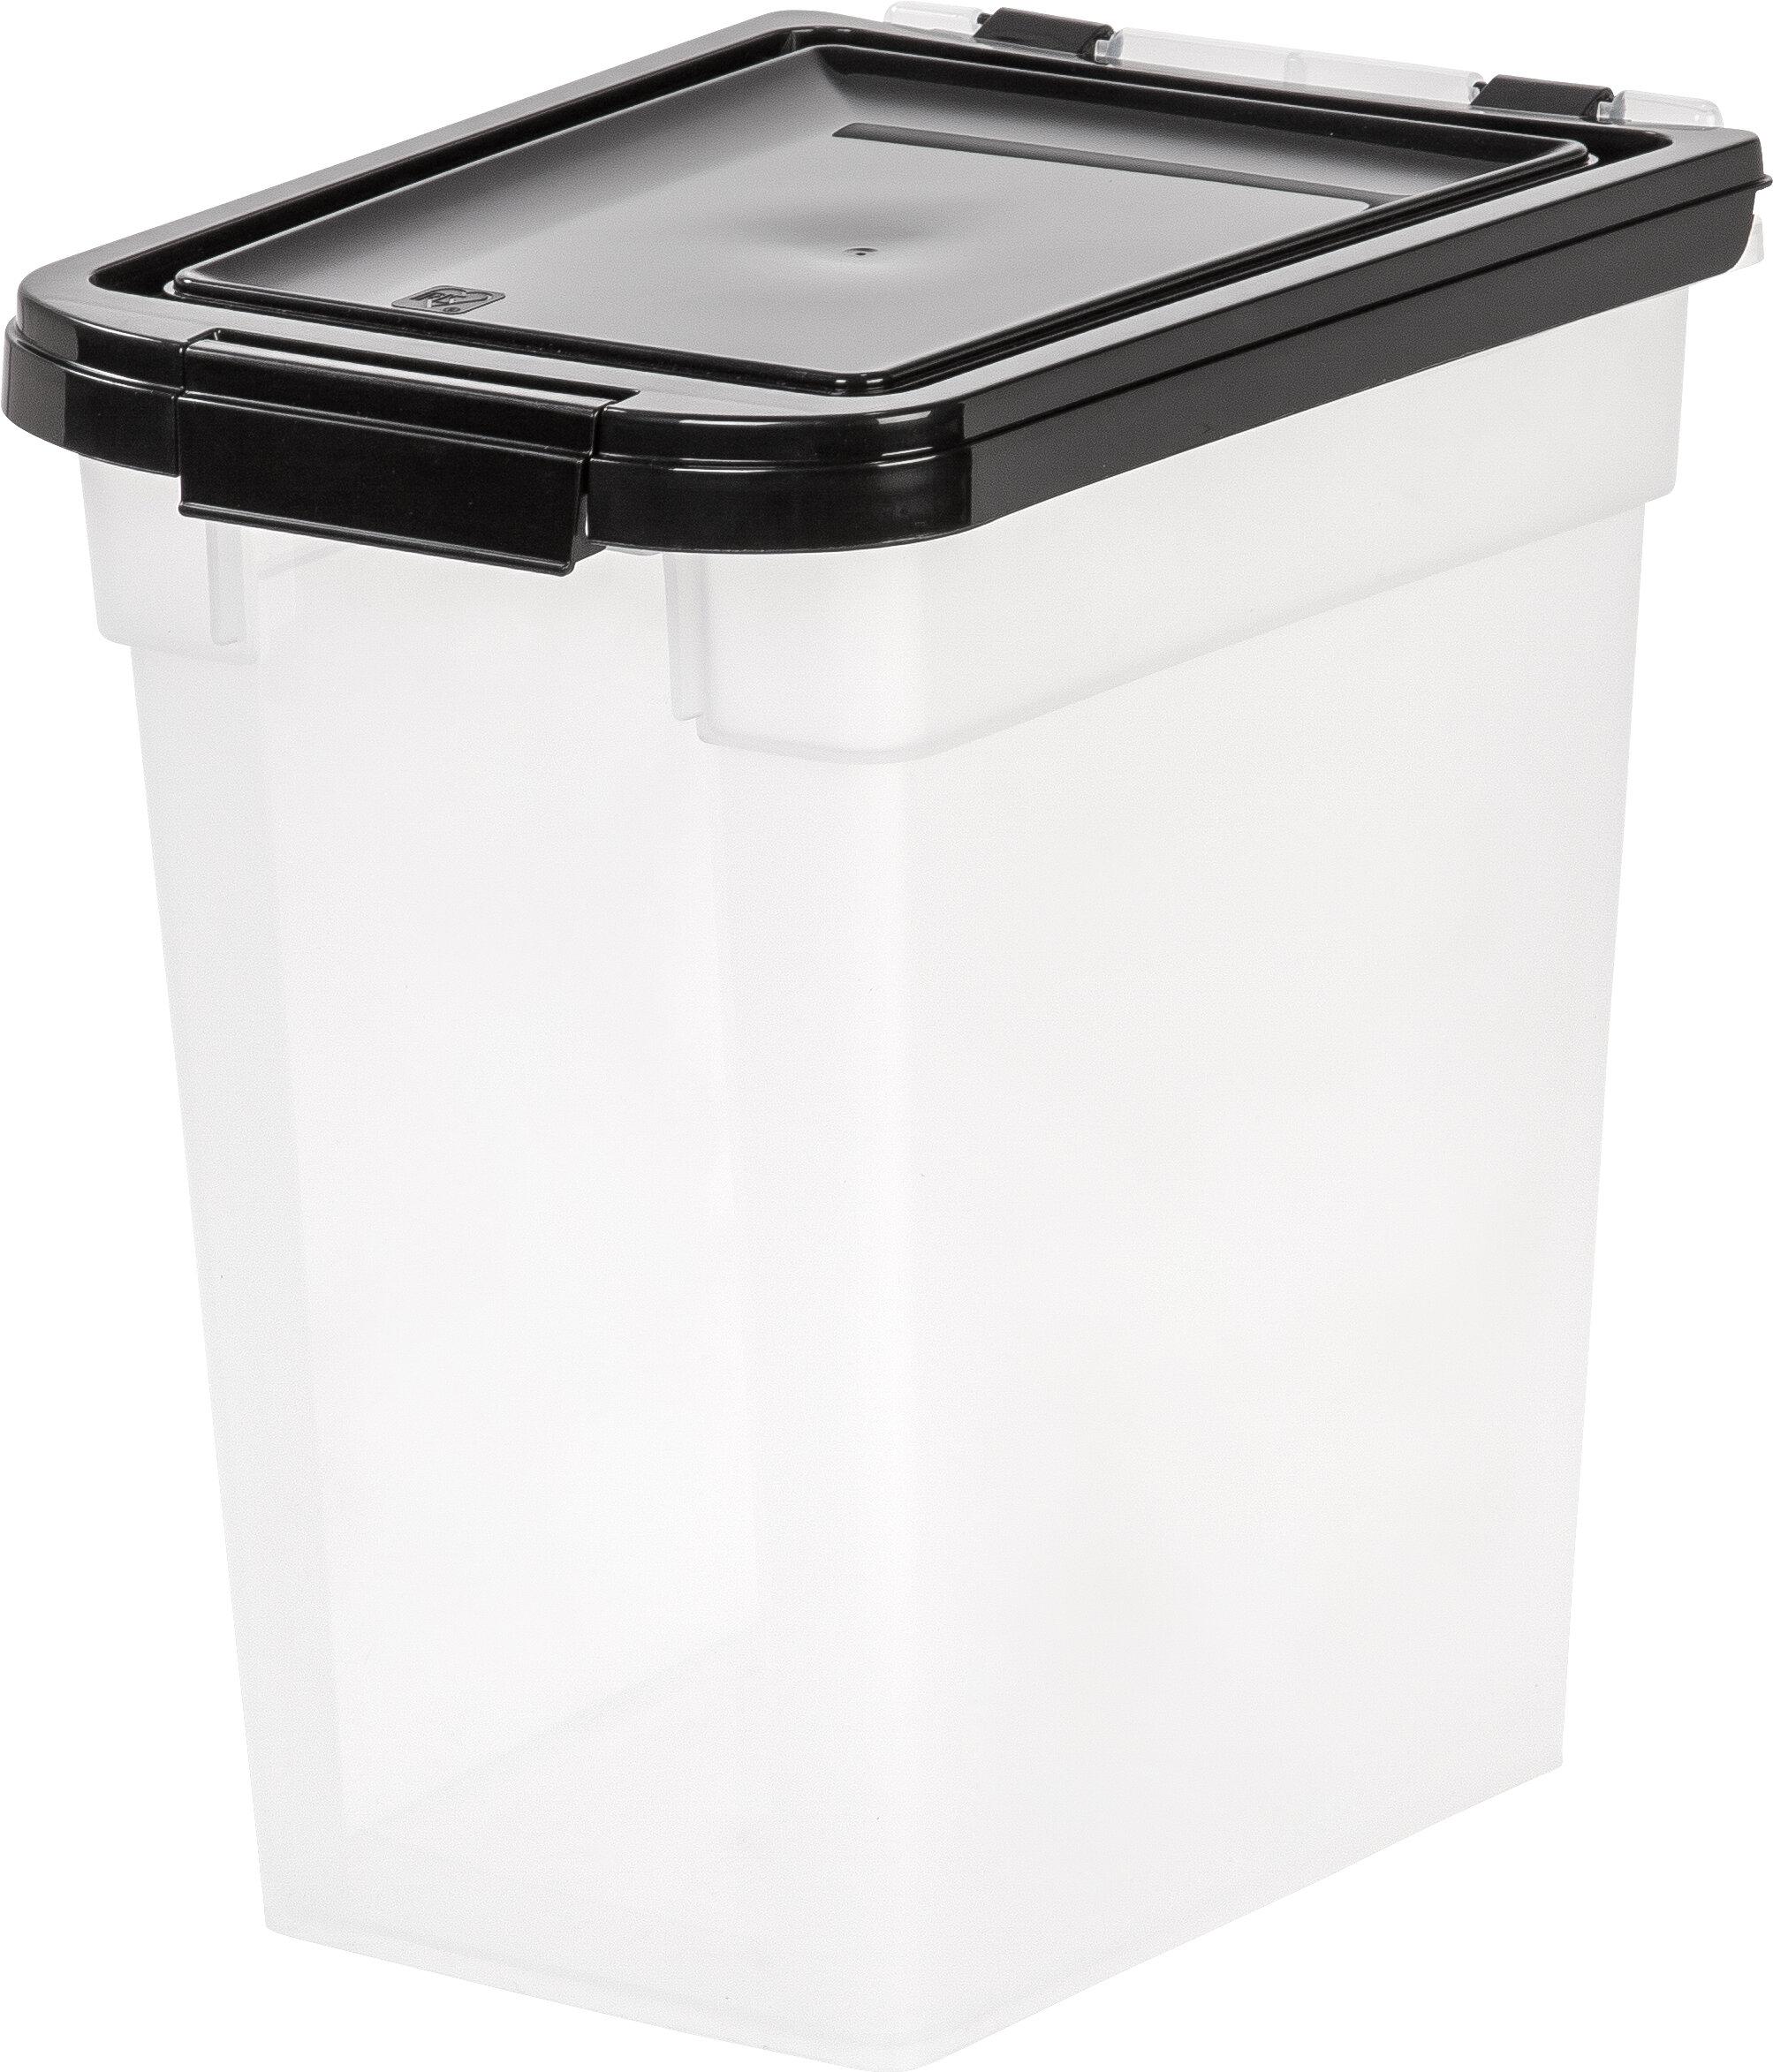 IRIS 160 Oz. Food Storage Container & Reviews | Wayfair